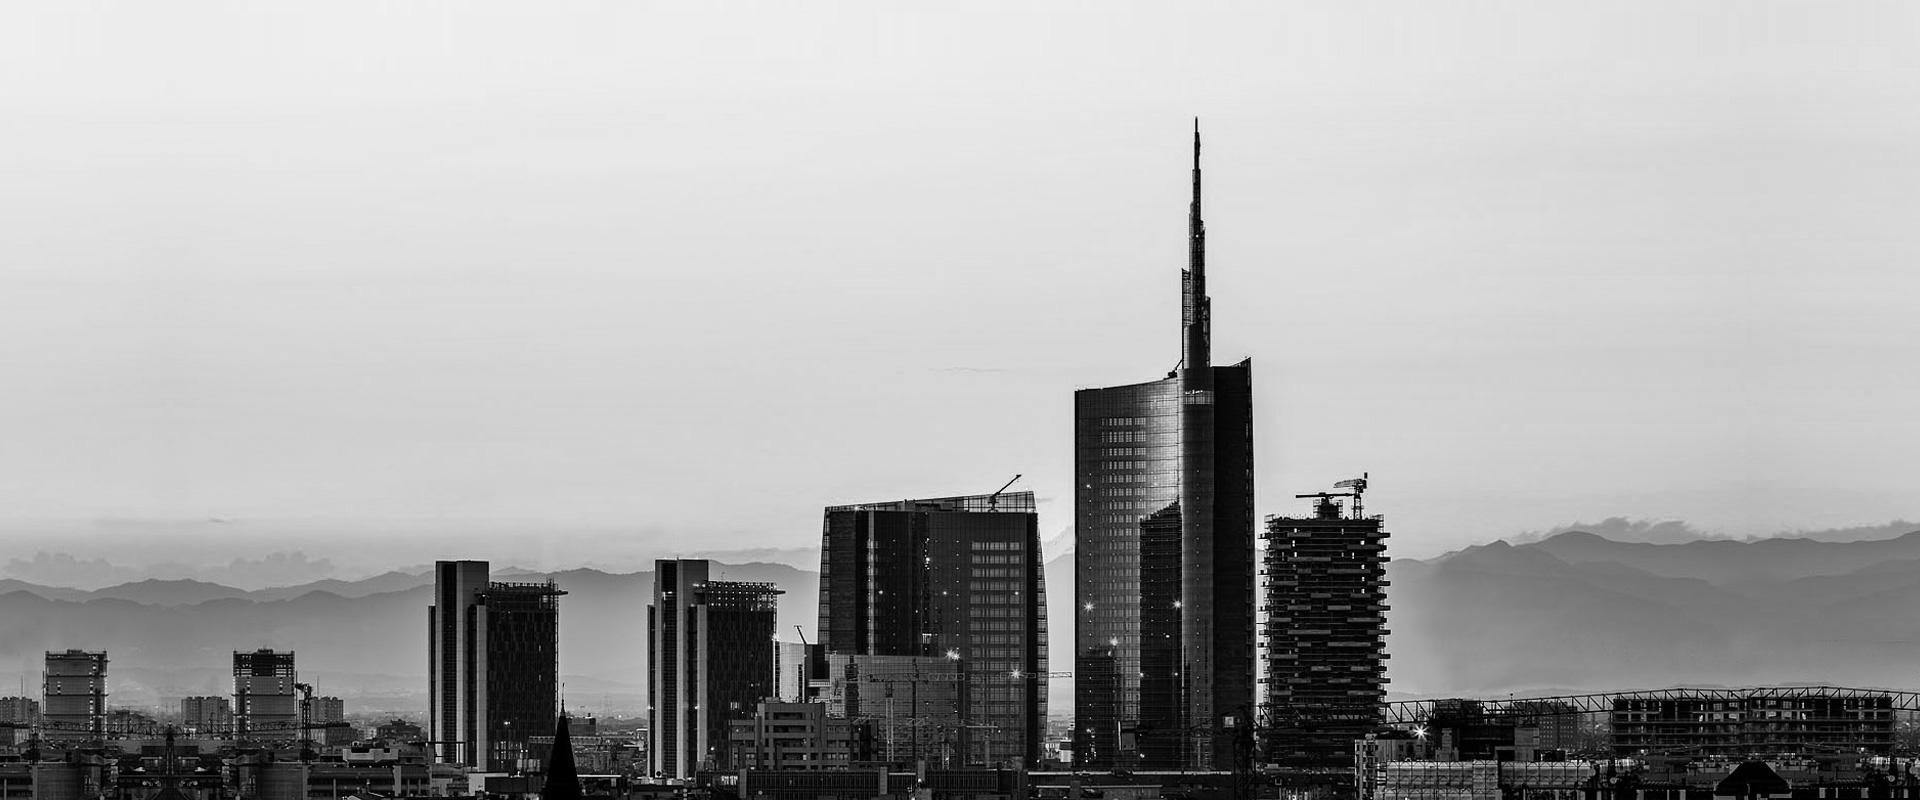 megliani-milano-news01